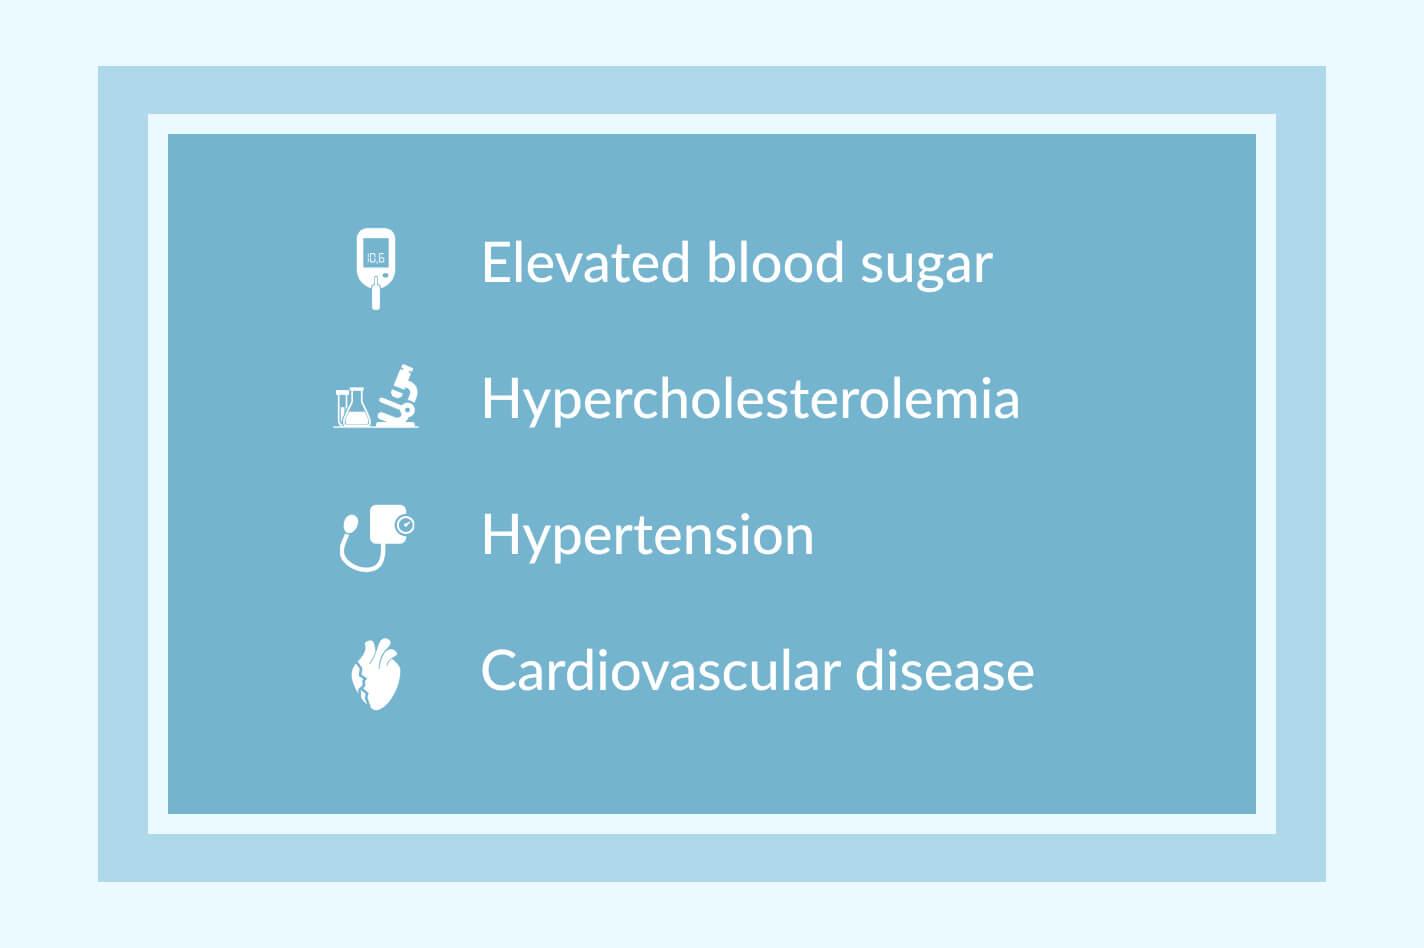 sedentary-lifestyle-causes-diseases